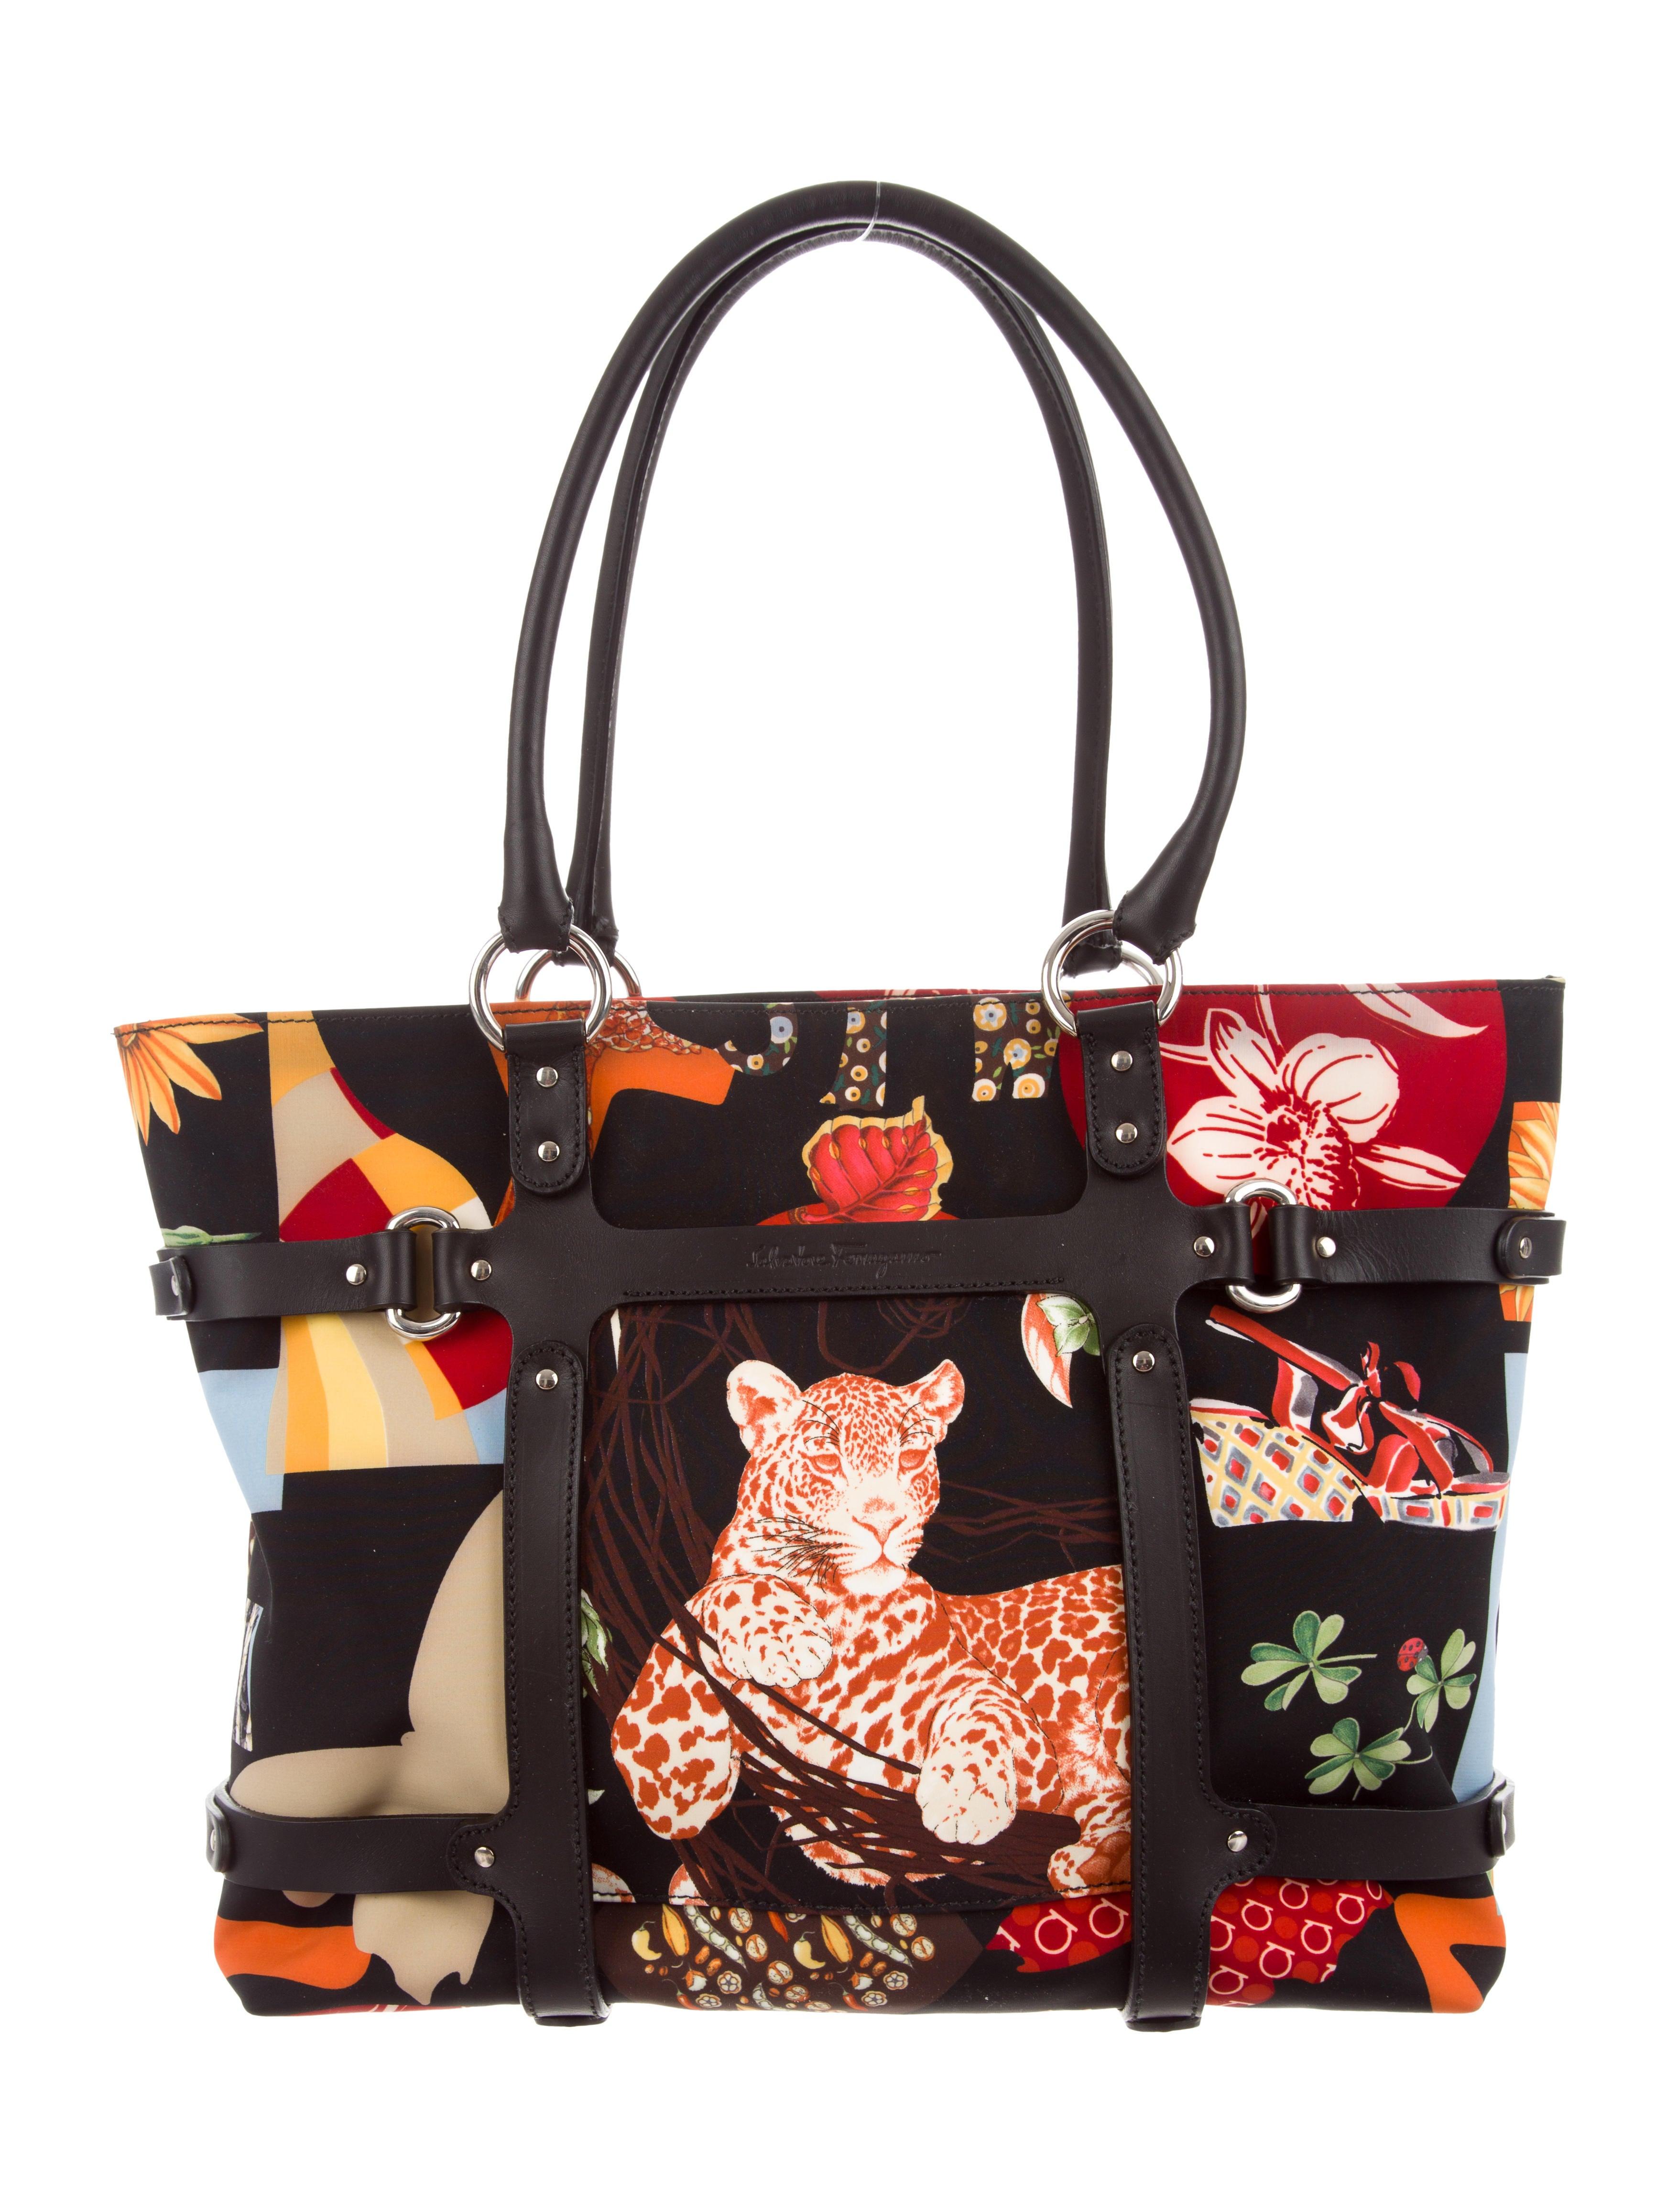 99095274af Salvatore Ferragamo Fiera Printed Tote - Handbags - SAL60070